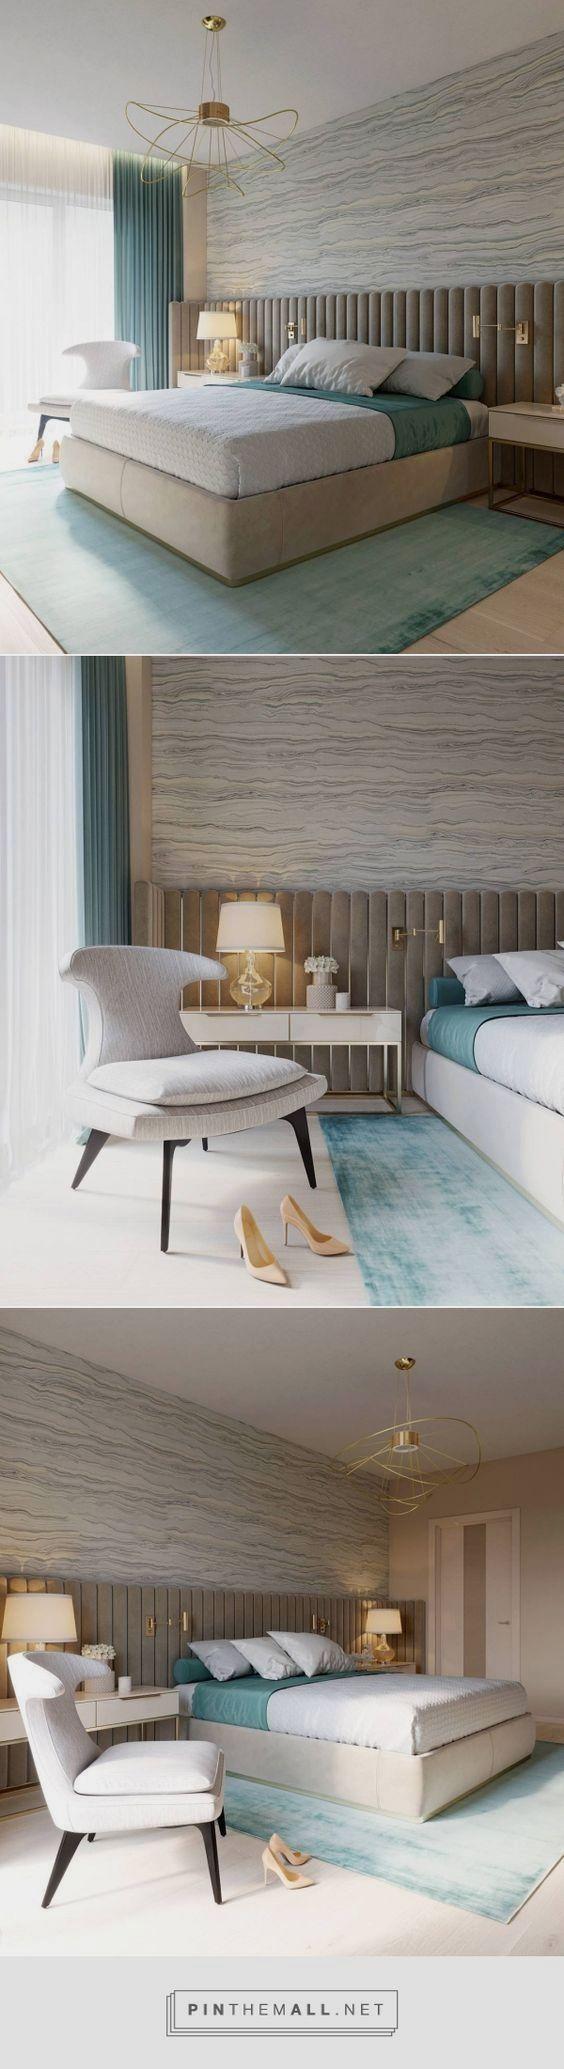 Classic bedroom interior decor interiordesign decor living